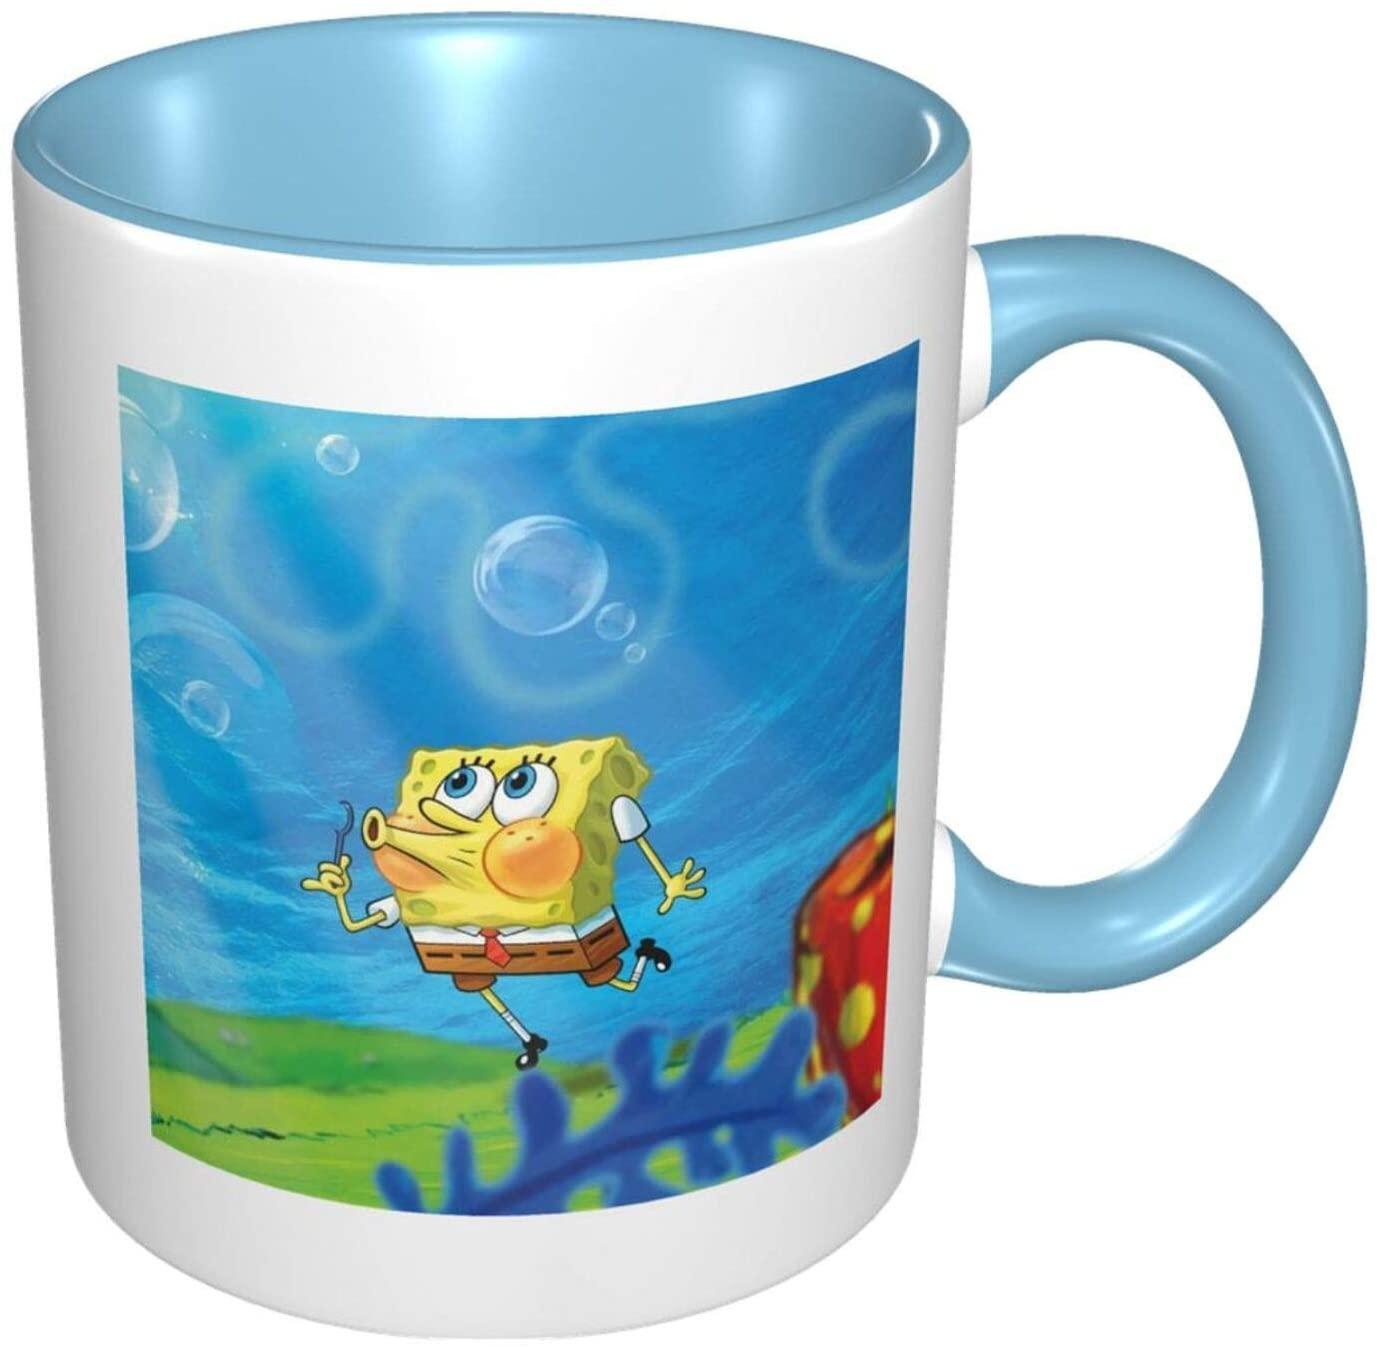 Coffee Mugs Sponge-Bob Square-Pants Spill Proof,Travel,Camping,Beer,Tea,Cute Funny Large Ceramic Big Cup Handwarmer Mug For Women And Men